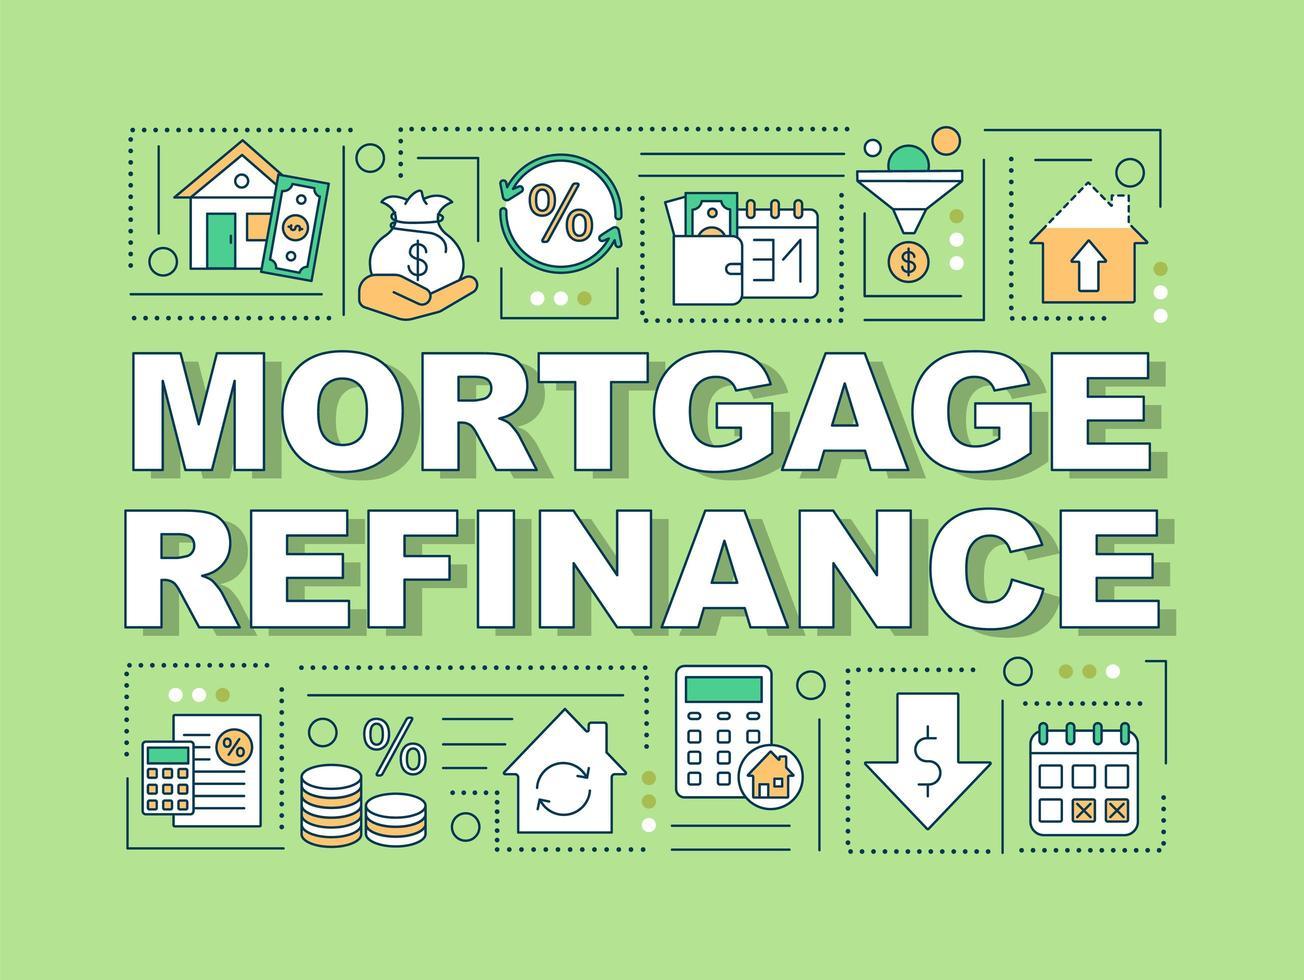 banner de conceptos de palabra de refinanciamiento de hipotecas vector